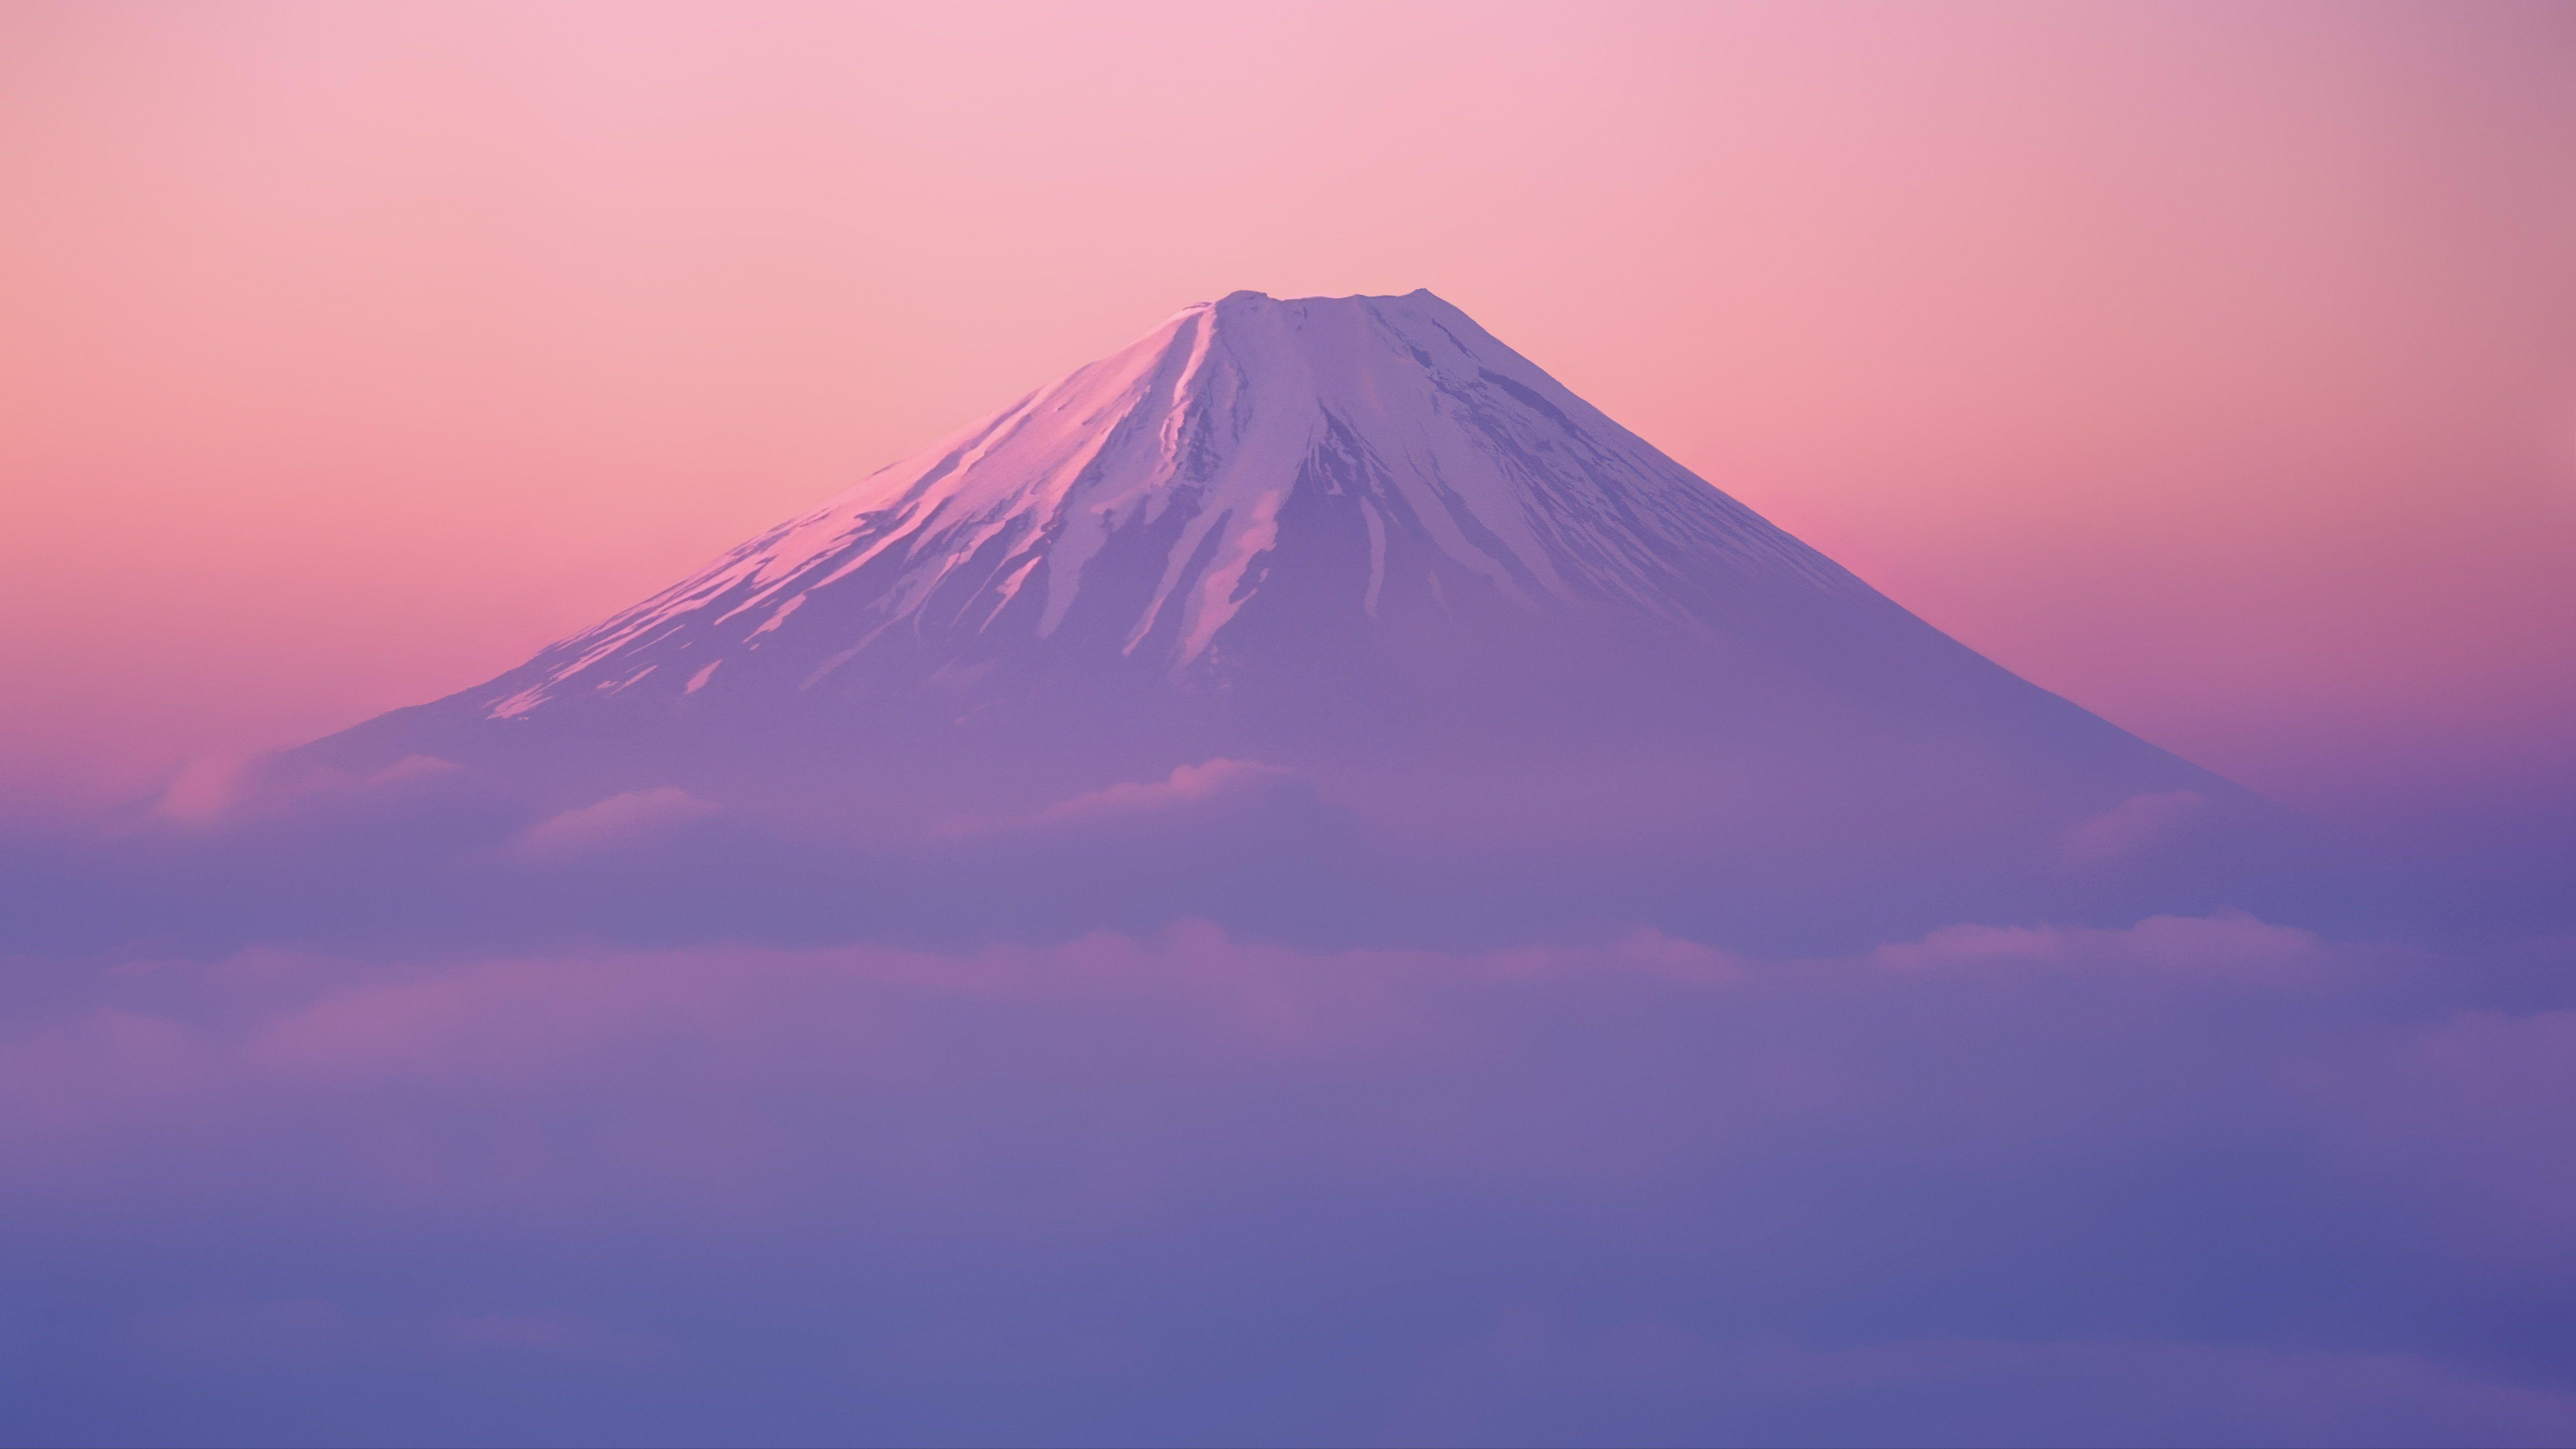 Mount Fuji Mac Os X Lion 5k Wallpaper Hdwallpaper Desktop Mount Fuji Wallpaper Japan Hd Wallpaper